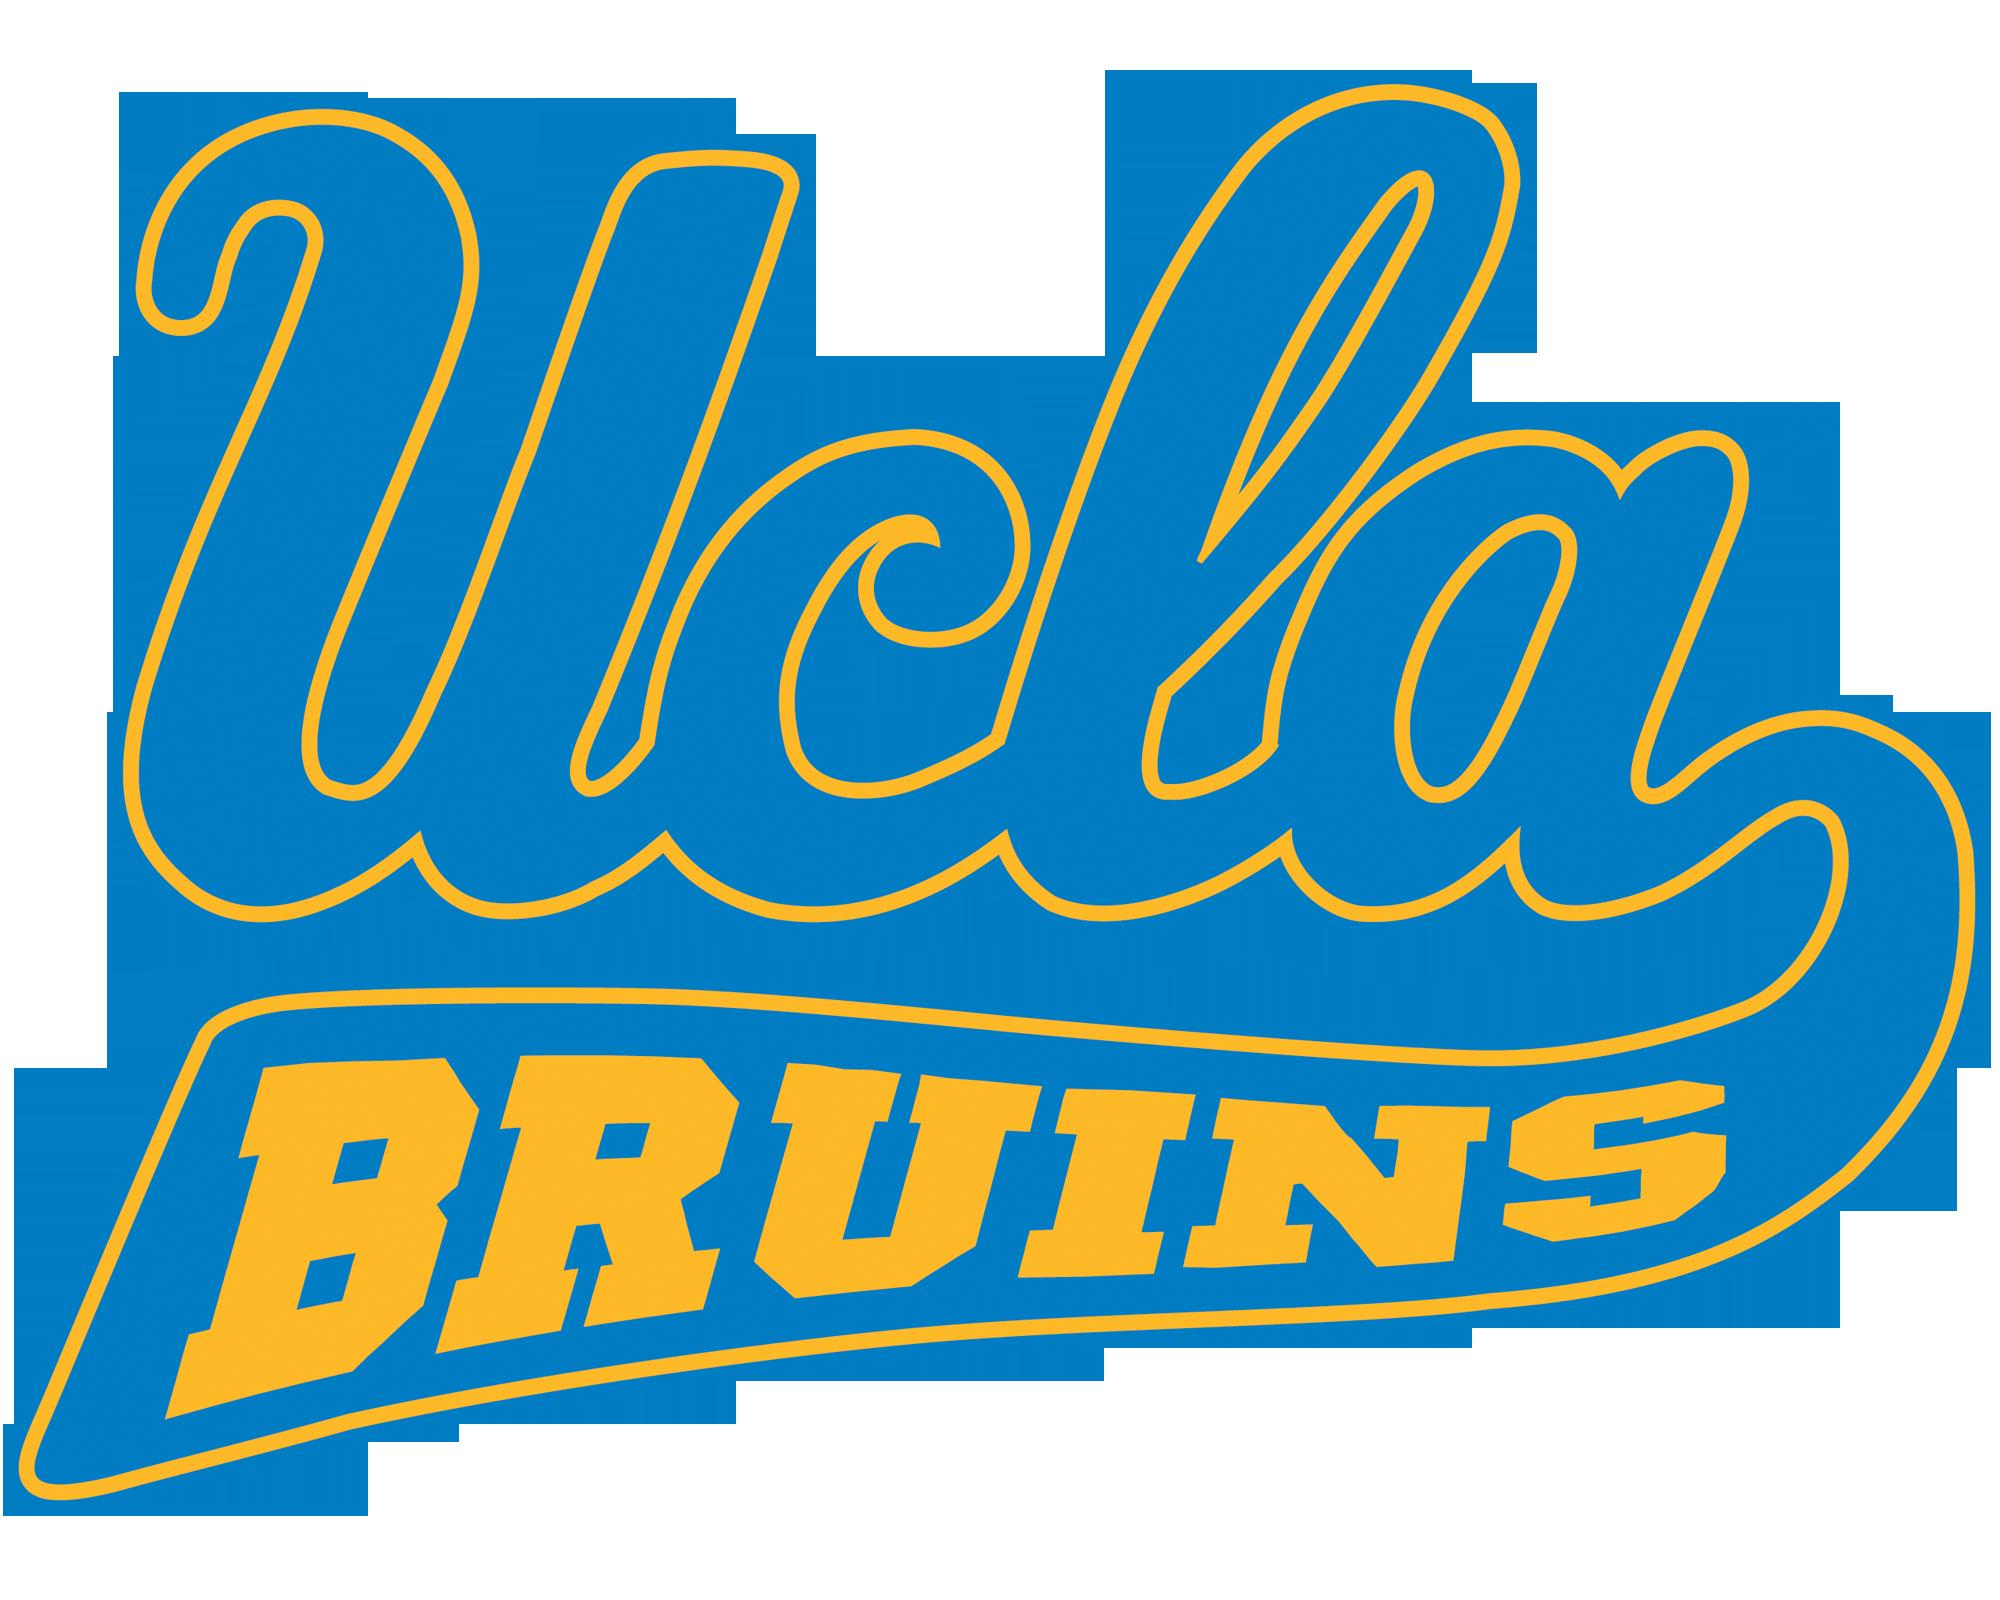 Oklahoma football clipart banner freeuse stock Athlazon - UCLA Football banner freeuse stock